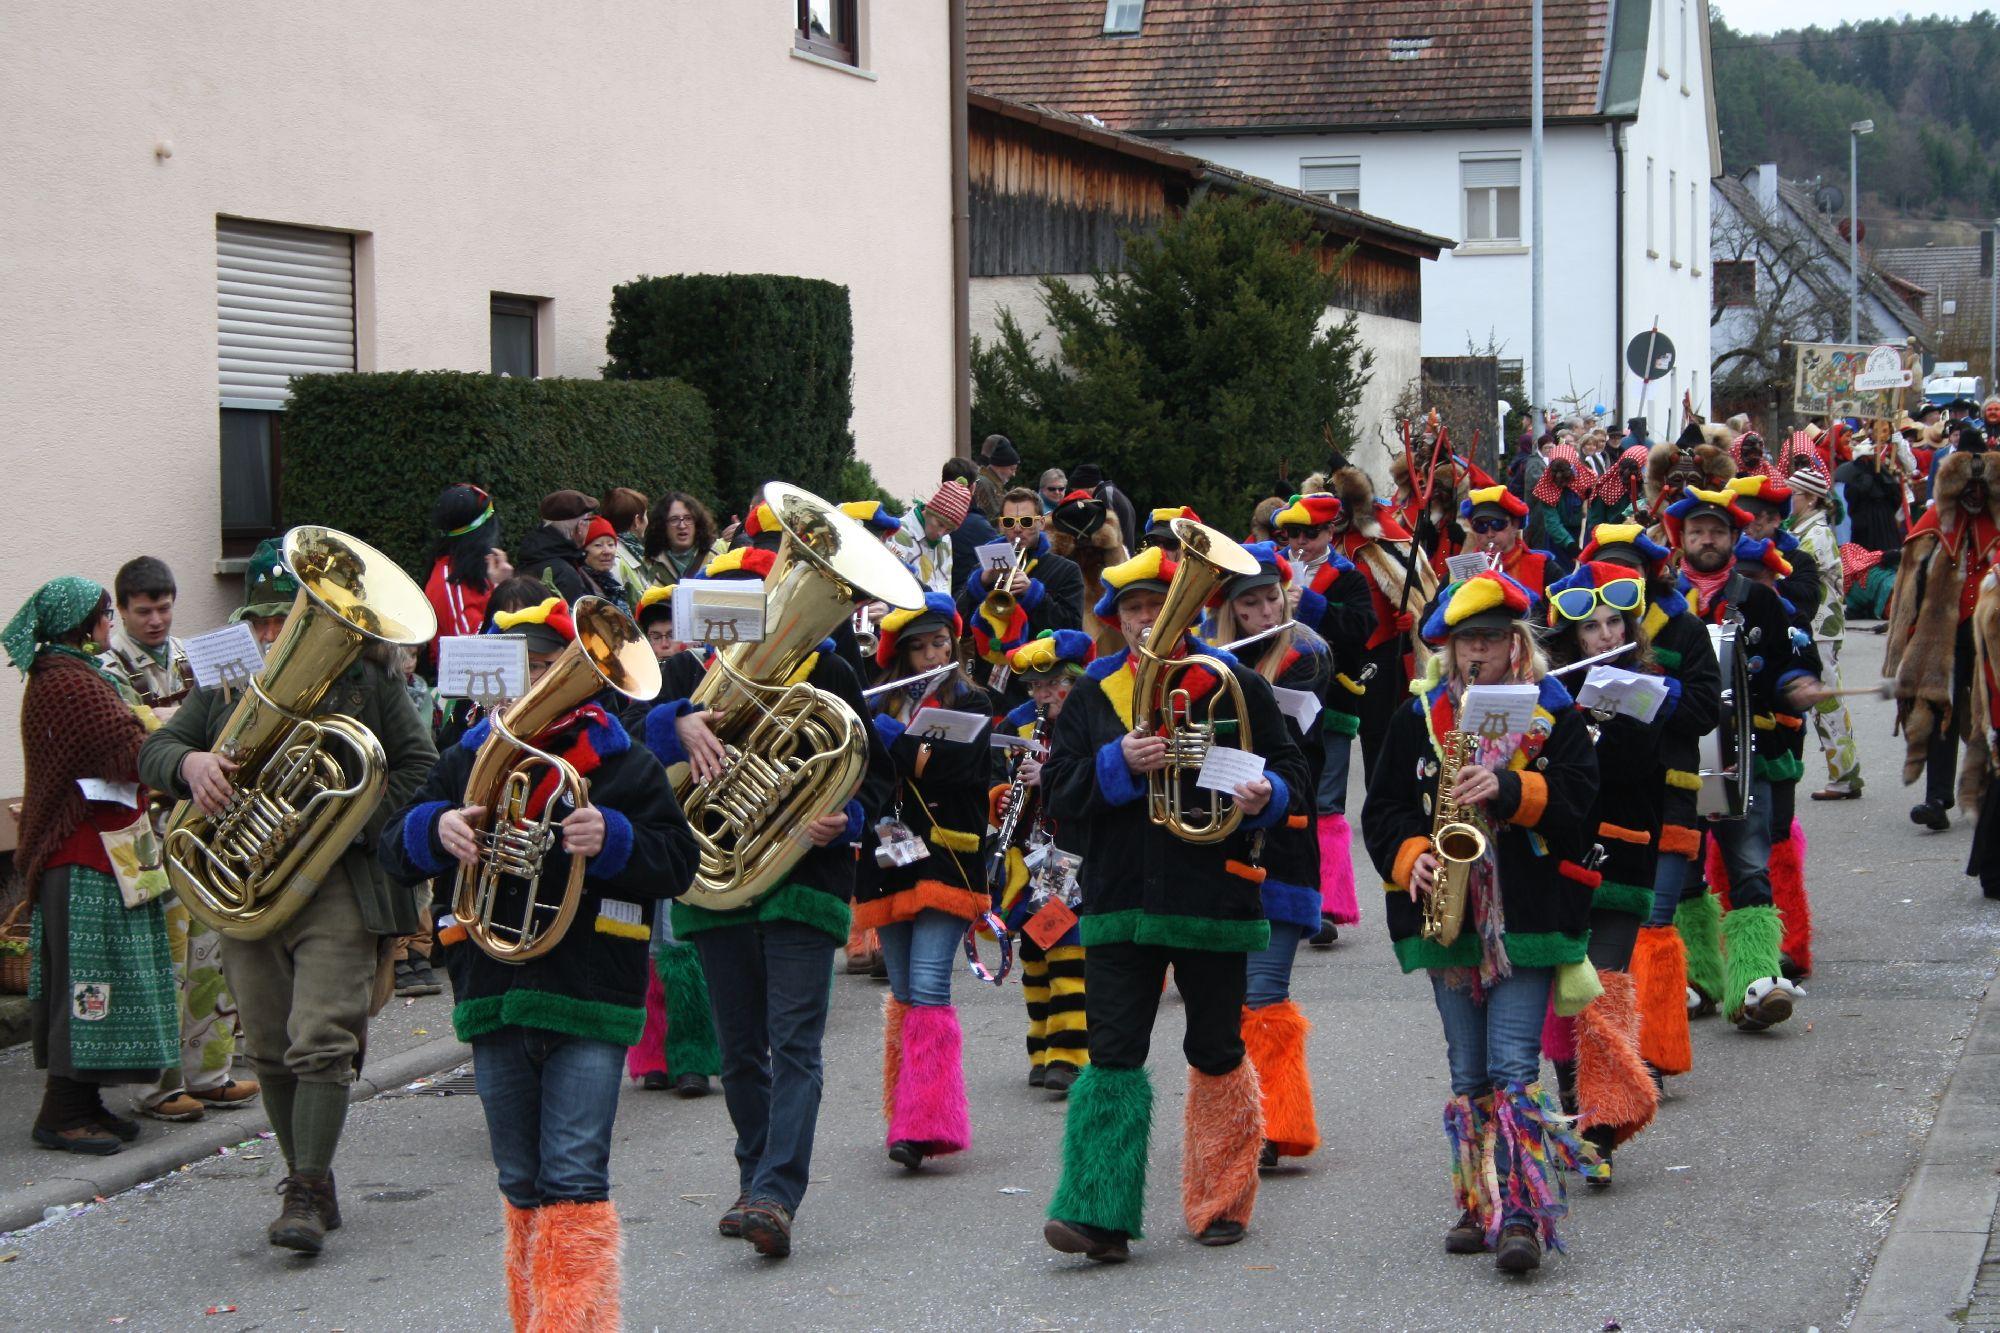 Dorauszunft Bad Saulgau 1355